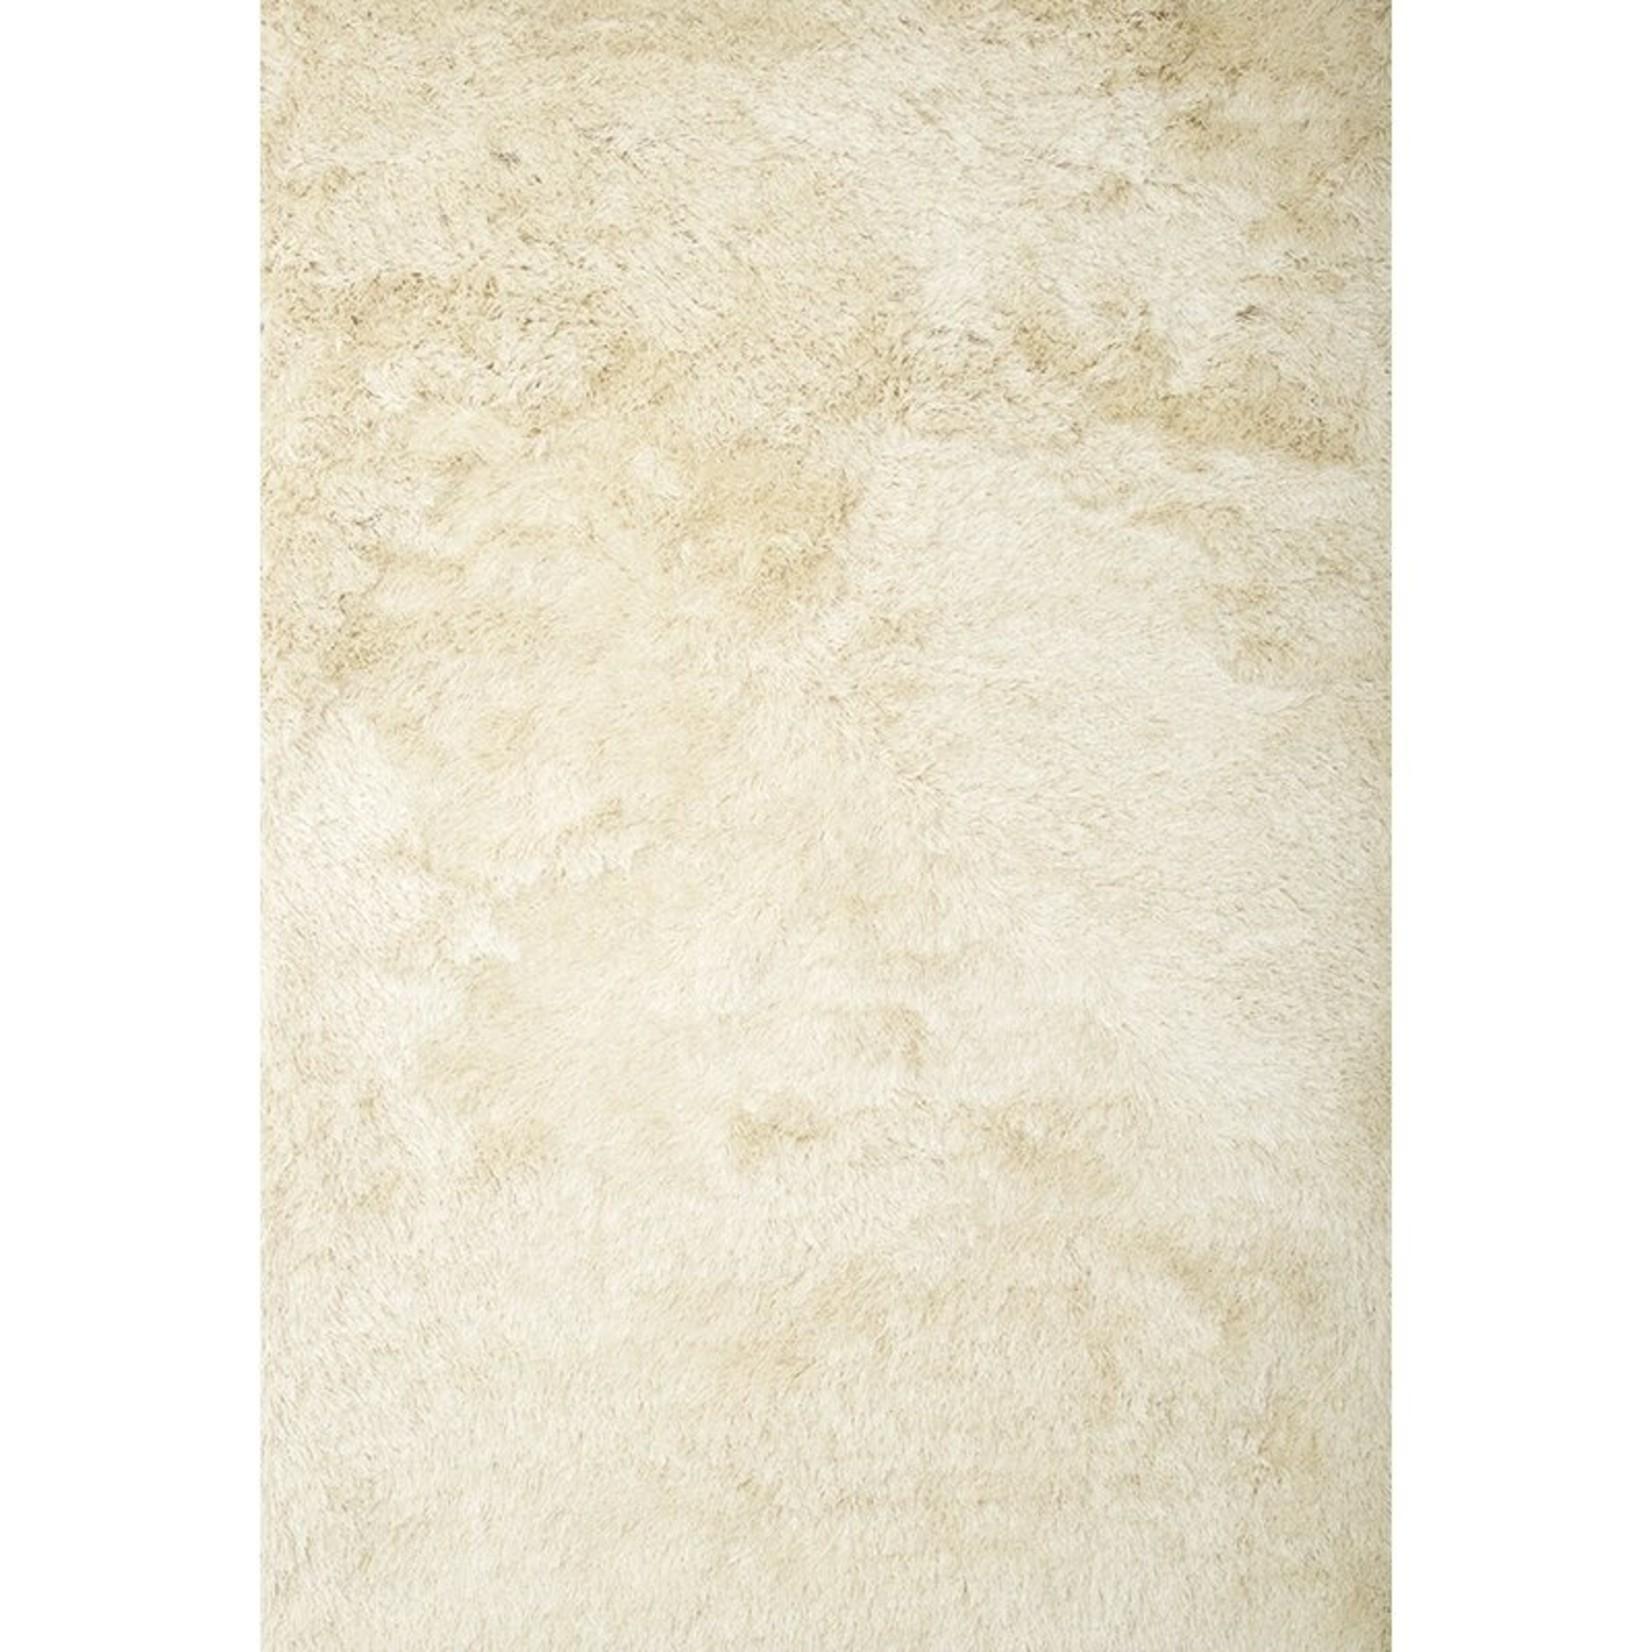 *5' x 8' - Yan Handmade Shag Ivory Area Rug